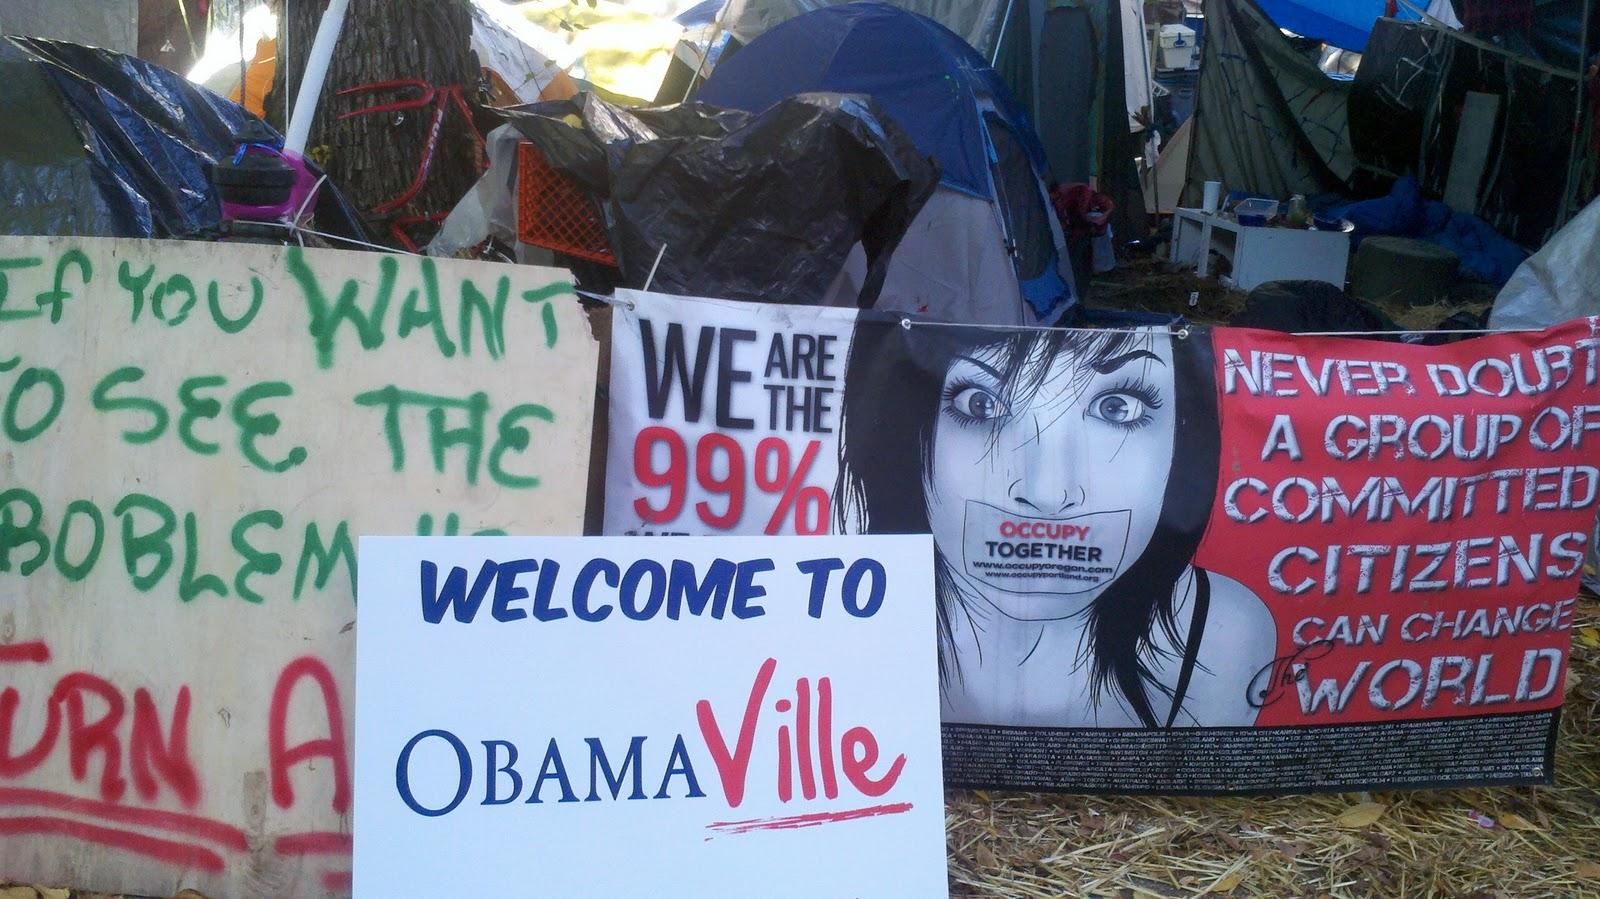 http://3.bp.blogspot.com/-ABf5XLivplg/TrGdxULERhI/AAAAAAAAGQM/G304565OBaI/s1600/obamaville%252B5.JPG